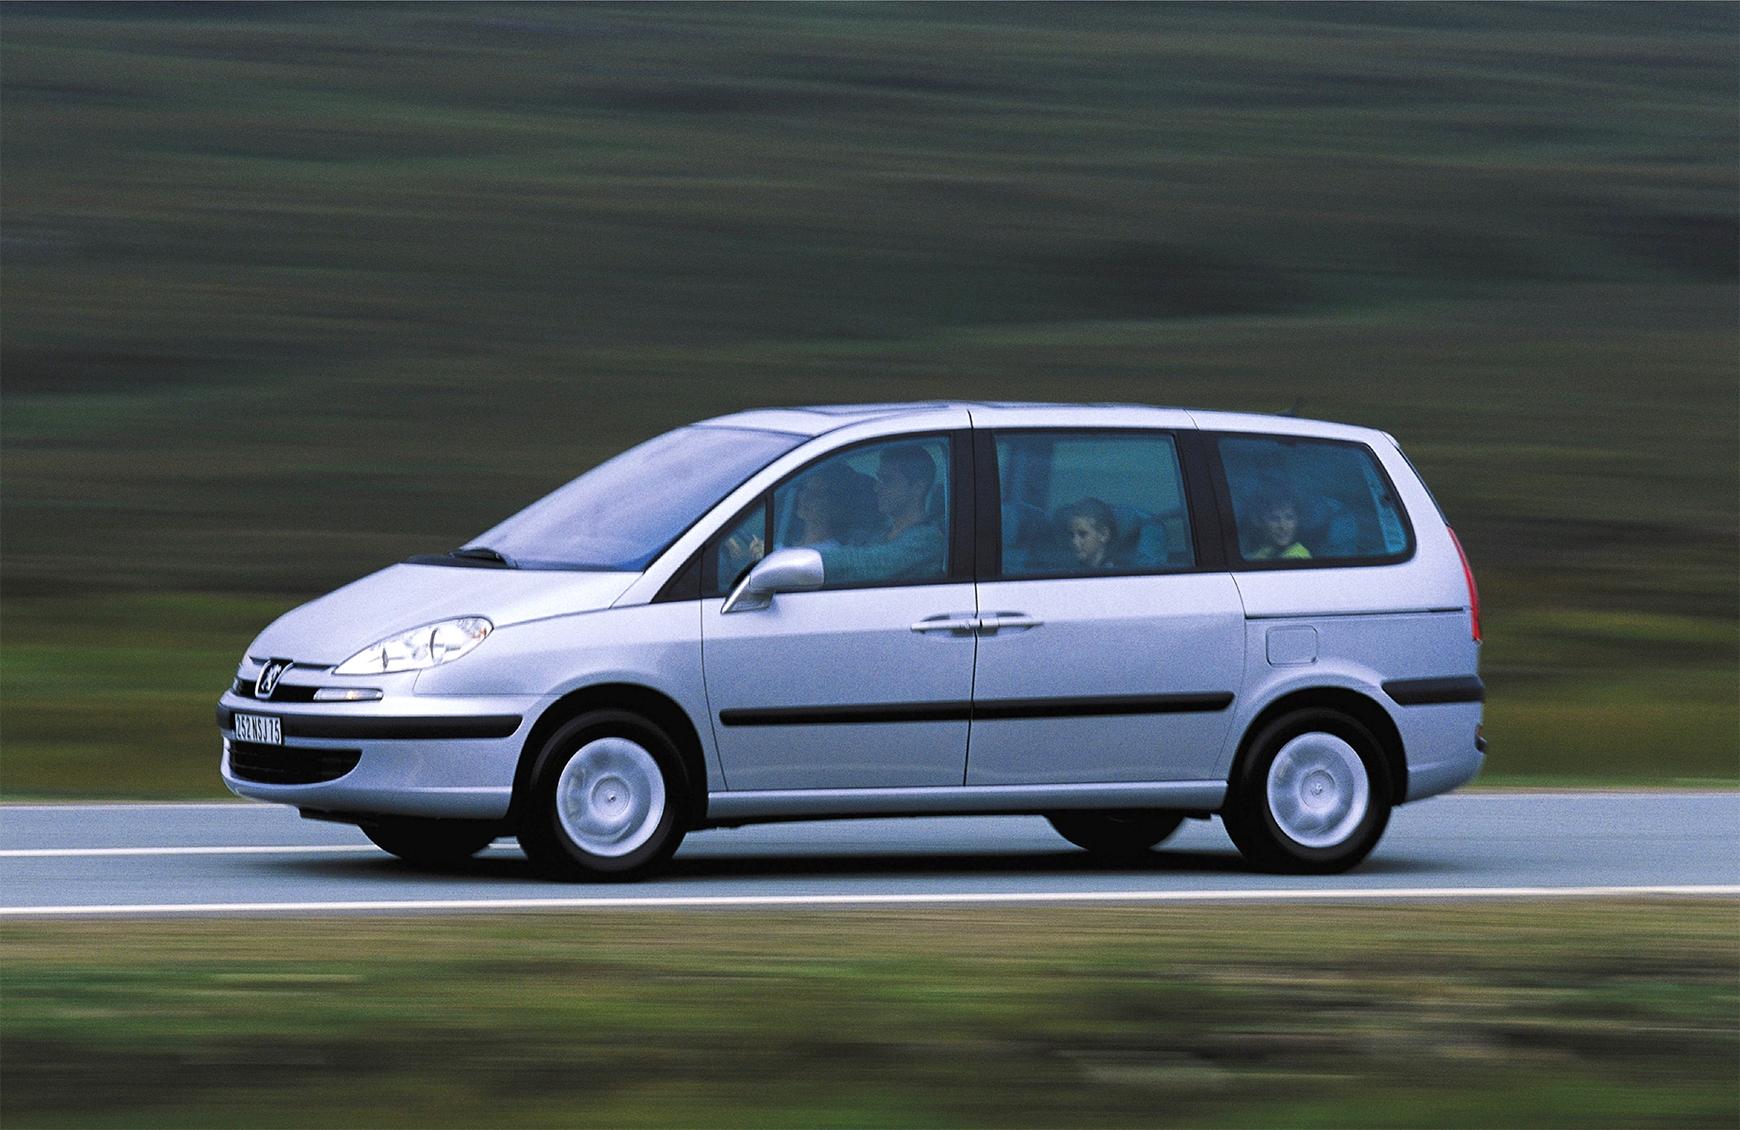 minivan peugeot 807 cinza lateral em movimento